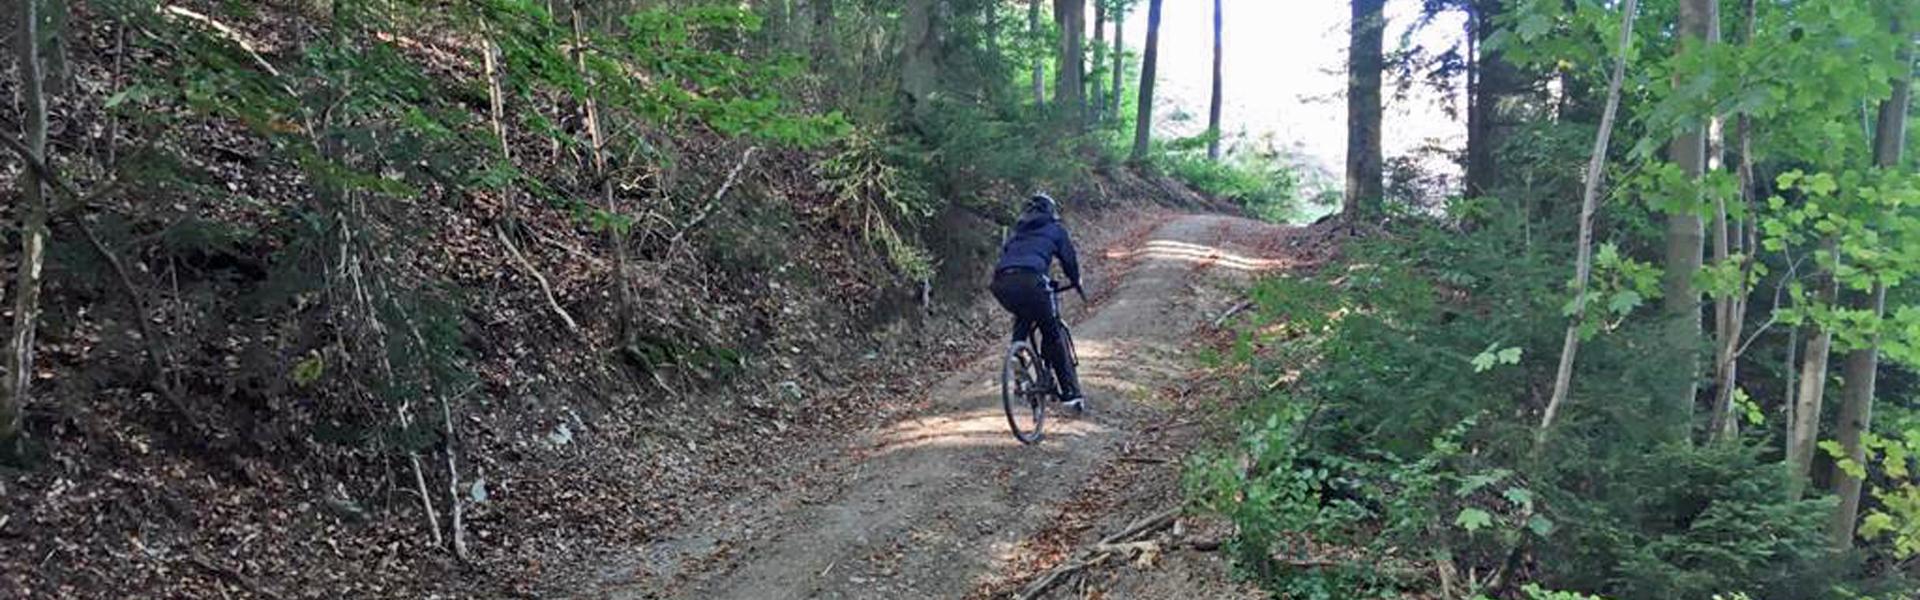 Mountainbike Level 2